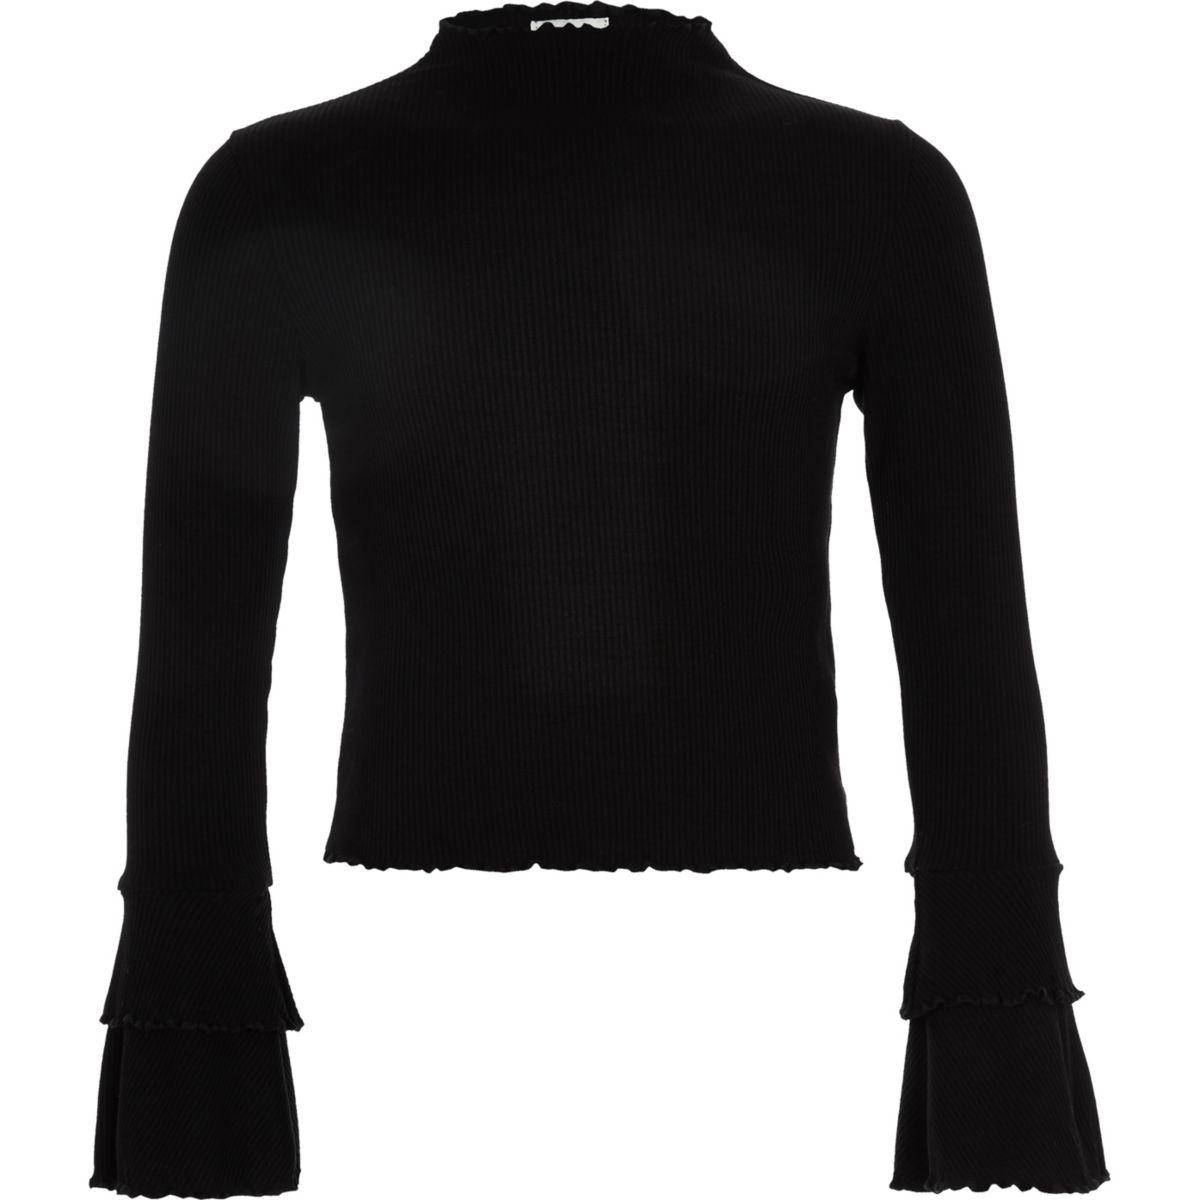 Girls black rib frill long sleeve top